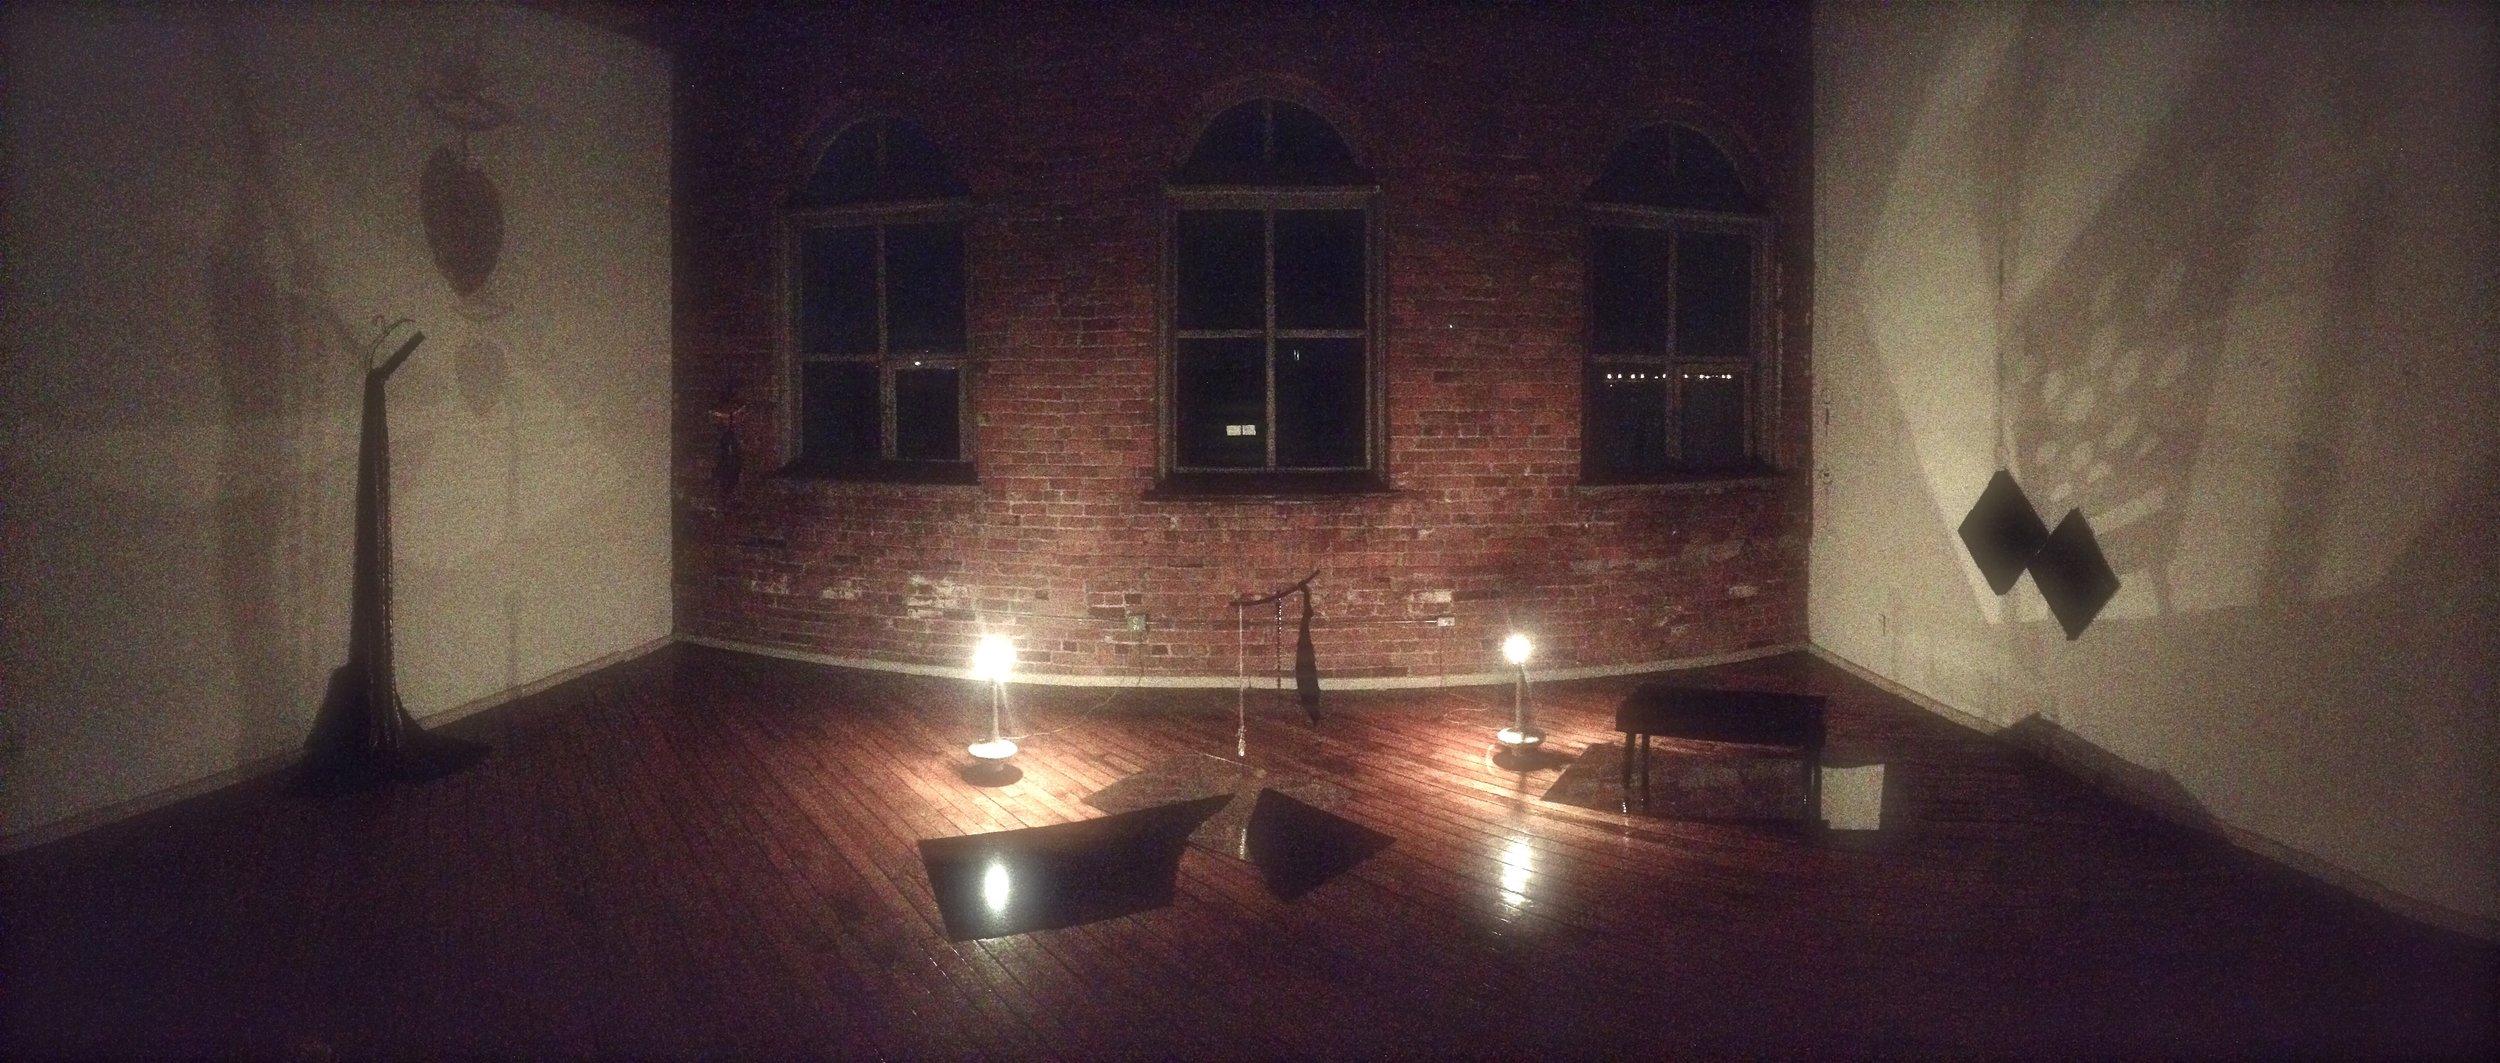 installation view, night